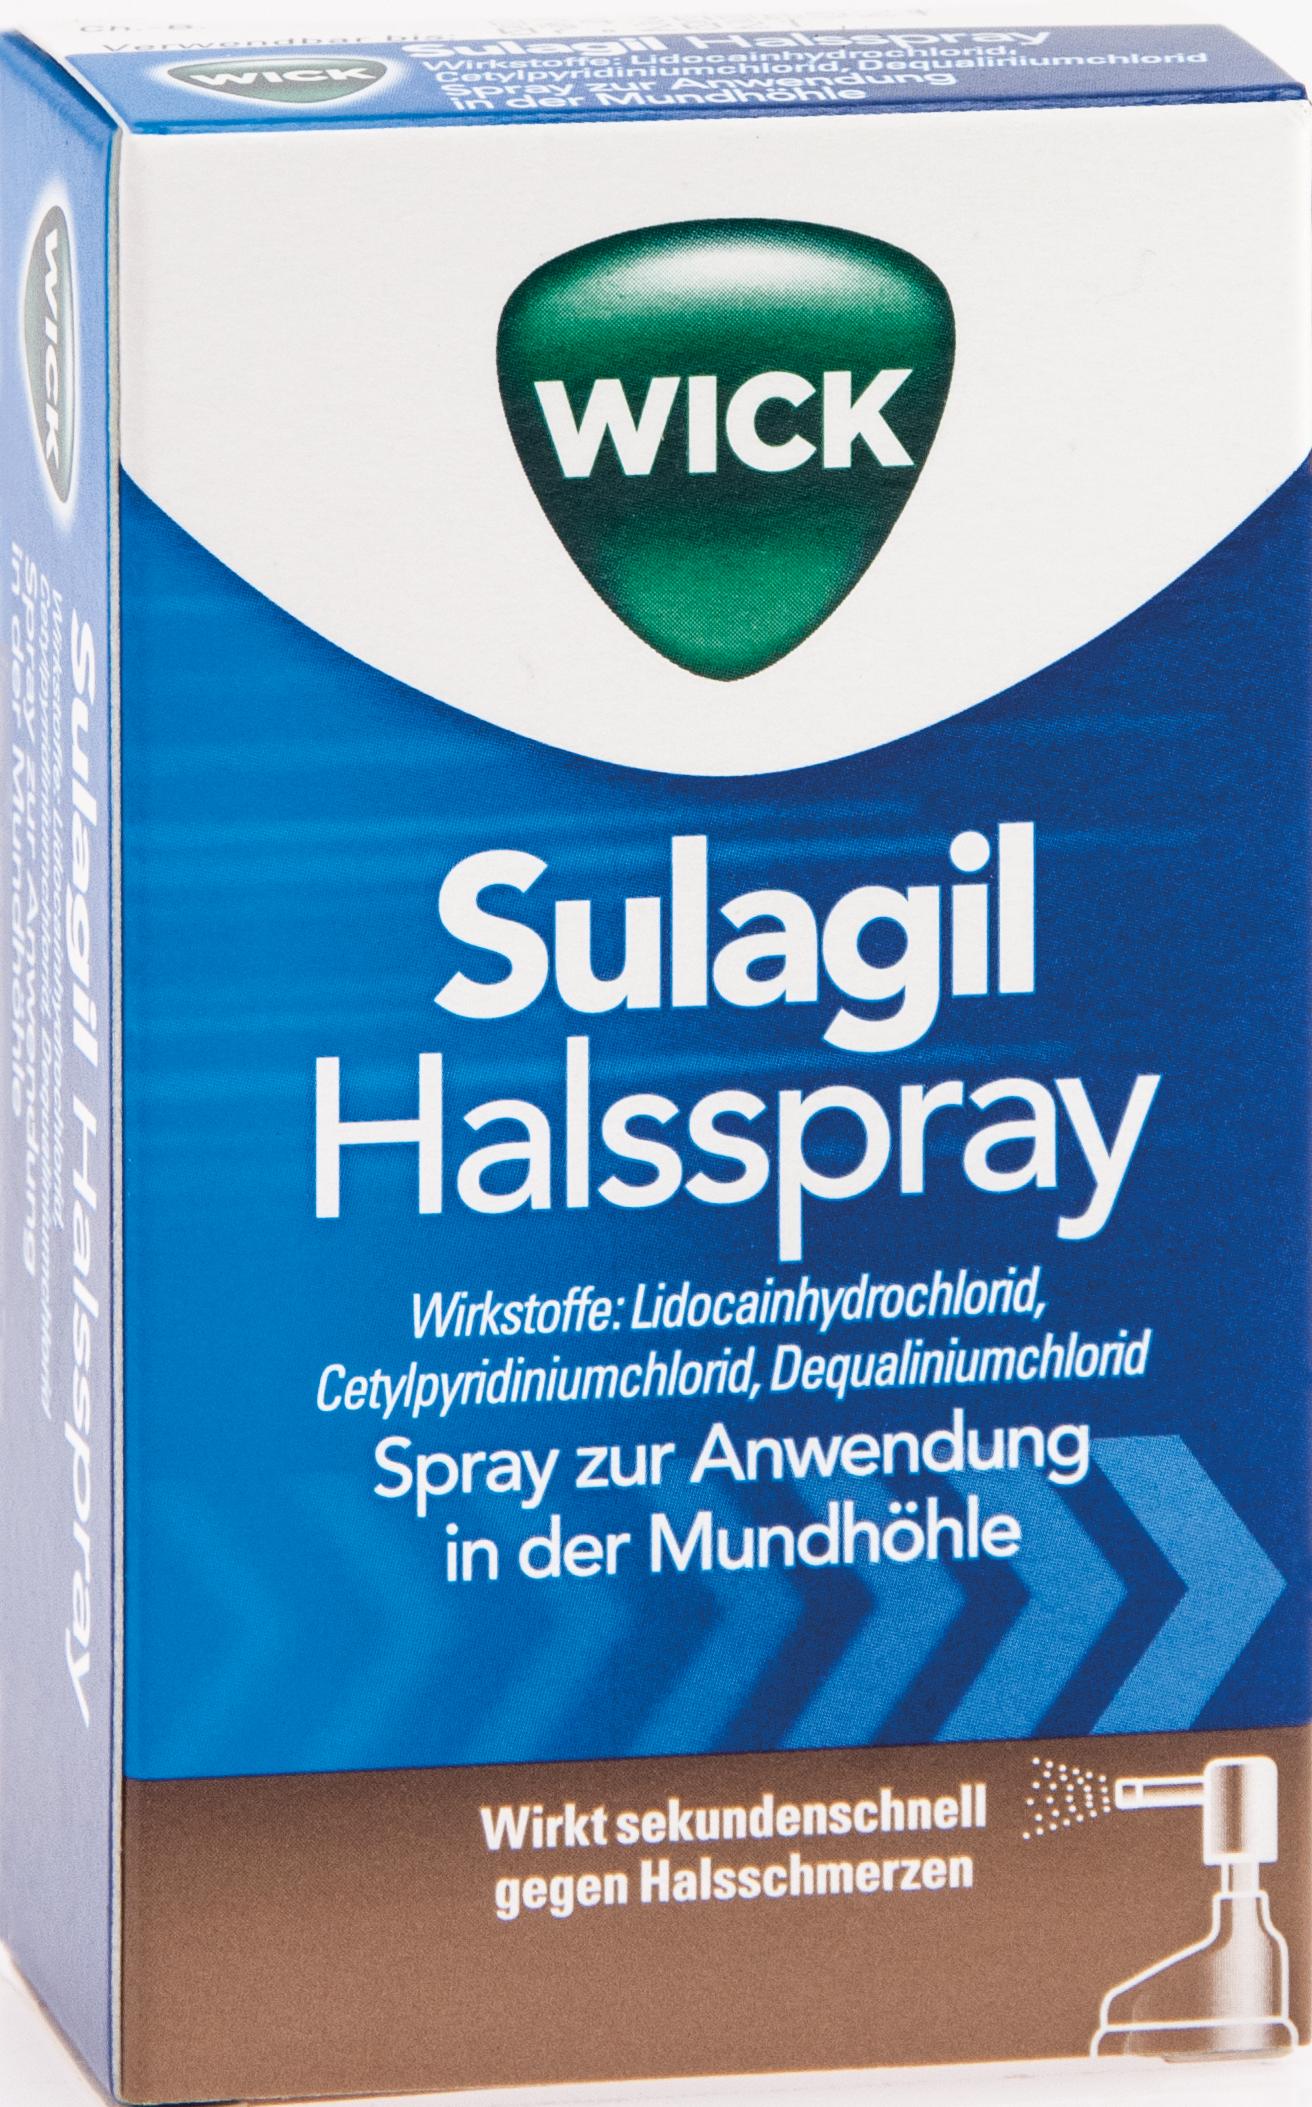 WICK SULAGIL HALSSPRAY 202002